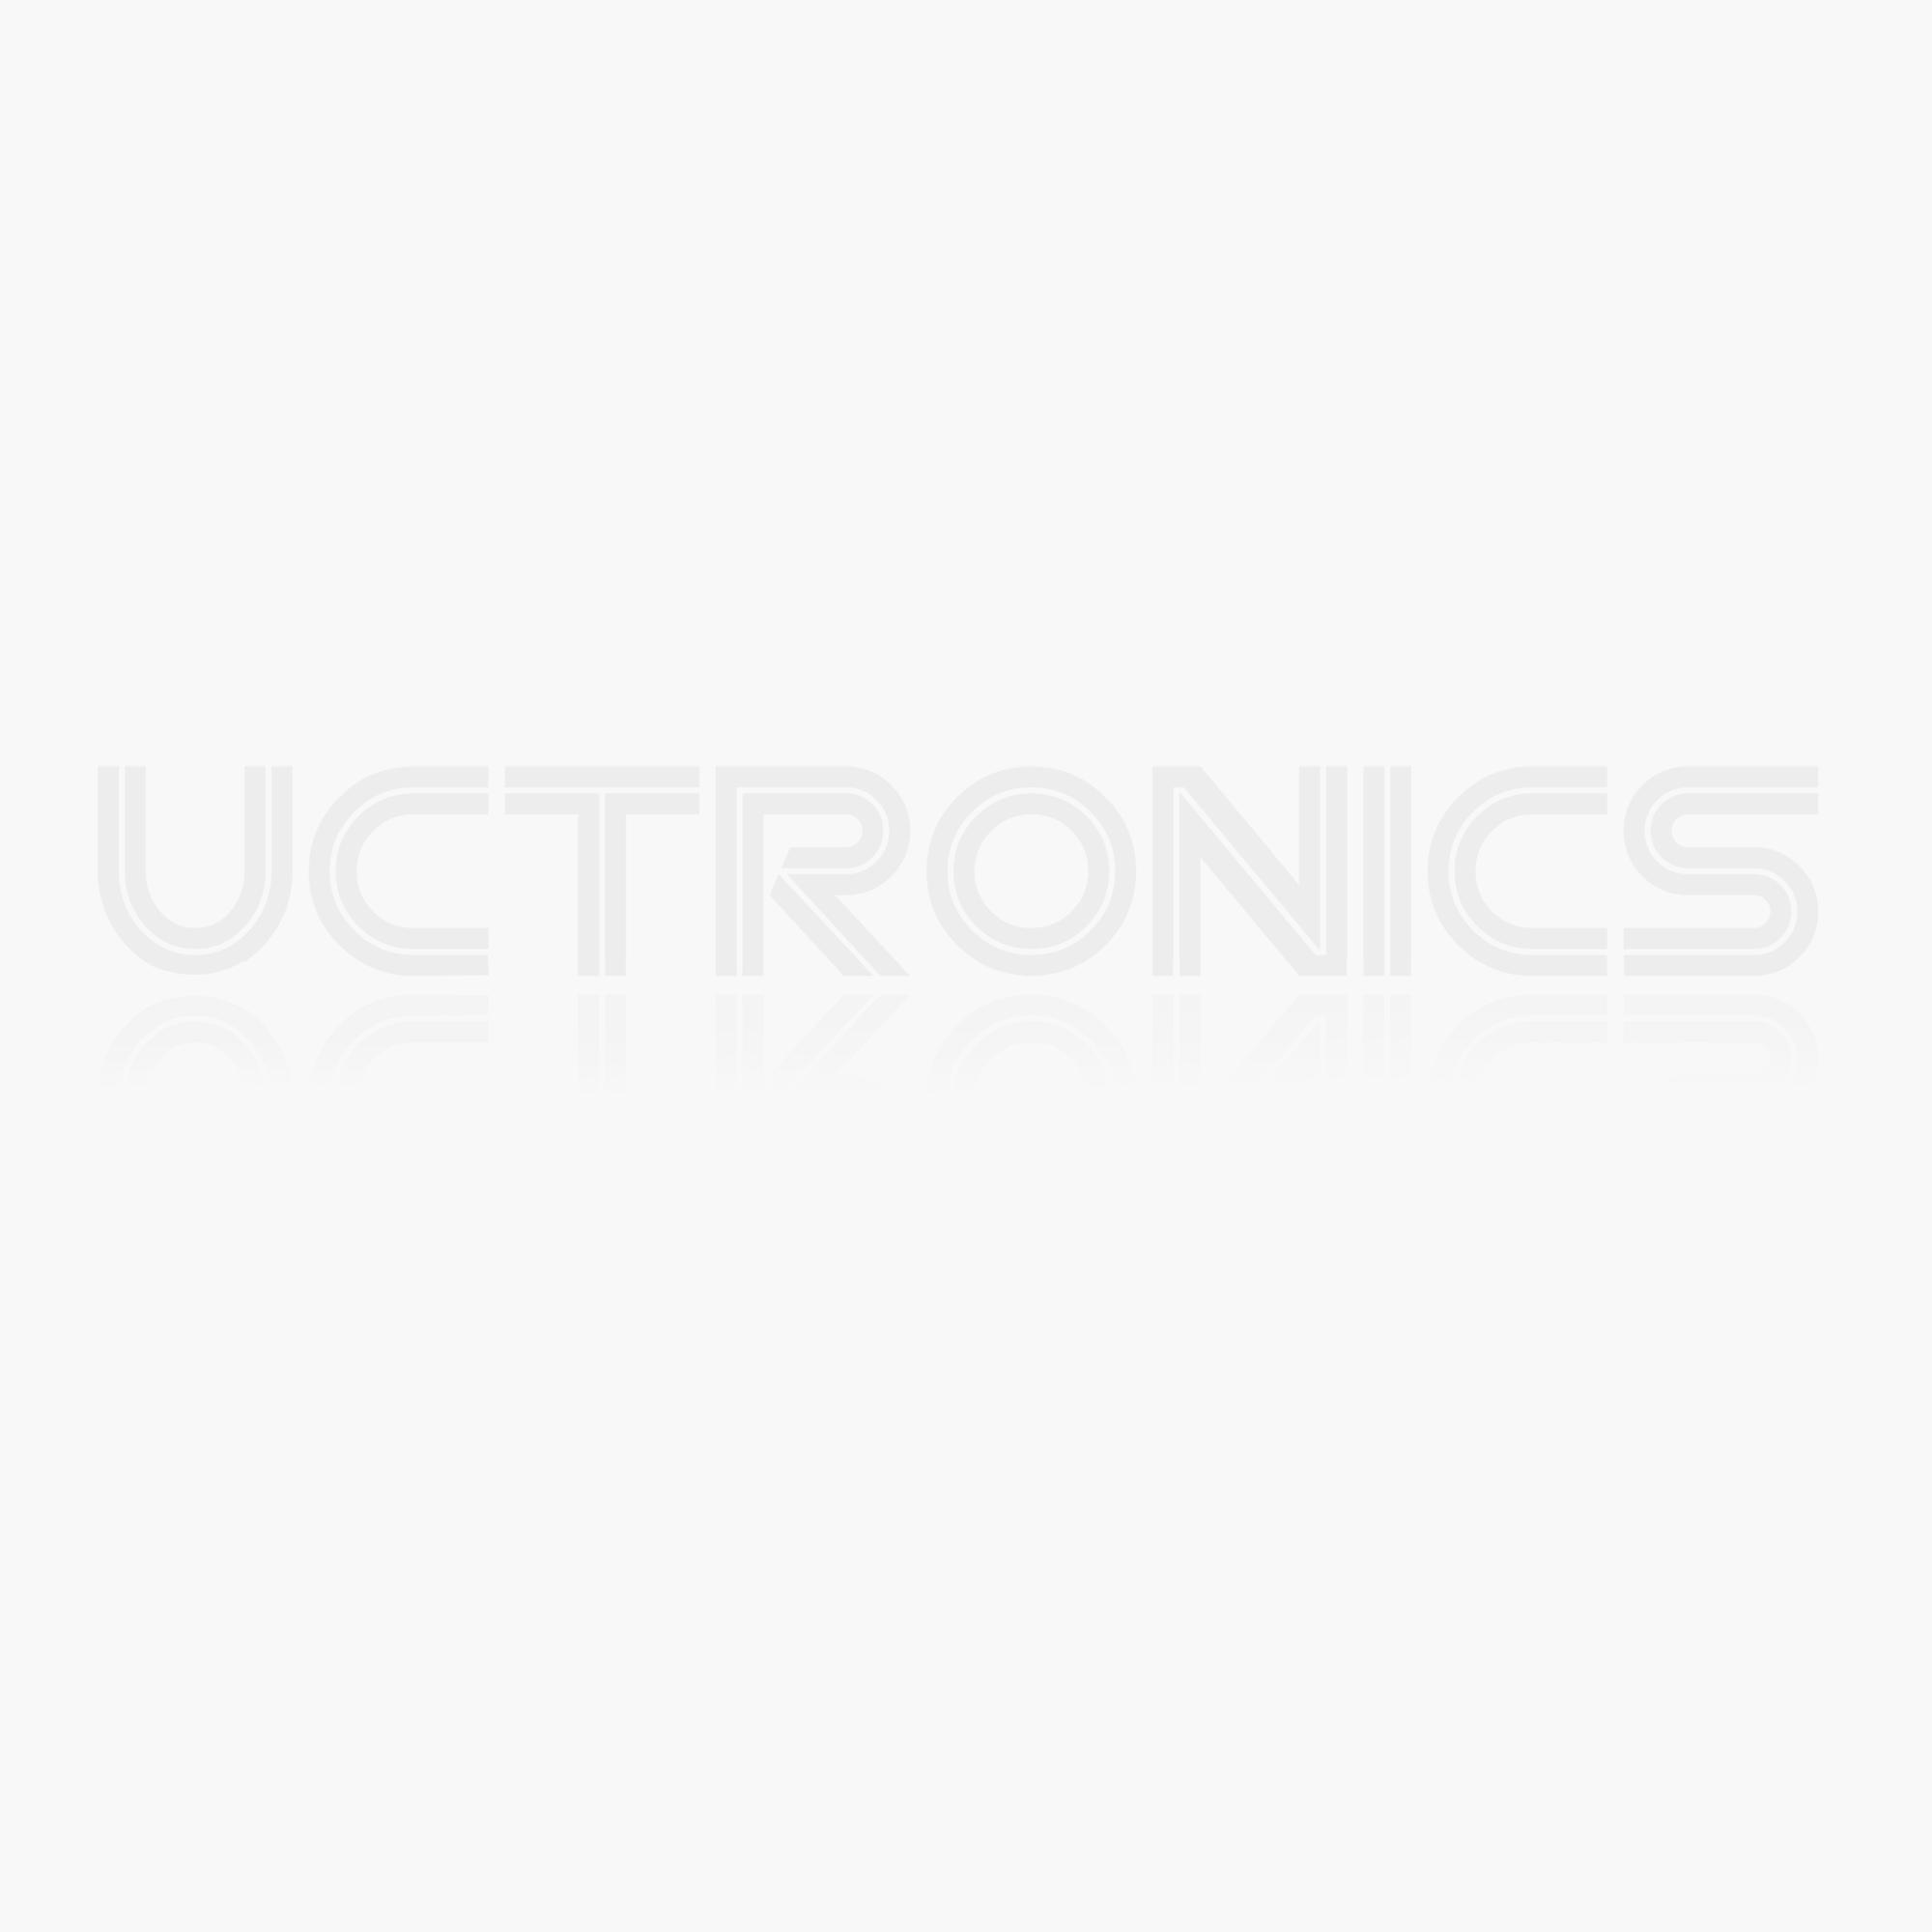 10pcs Extruder Springs Nickel for 3D Printer Accessories Wade Ultimaker Makerbot